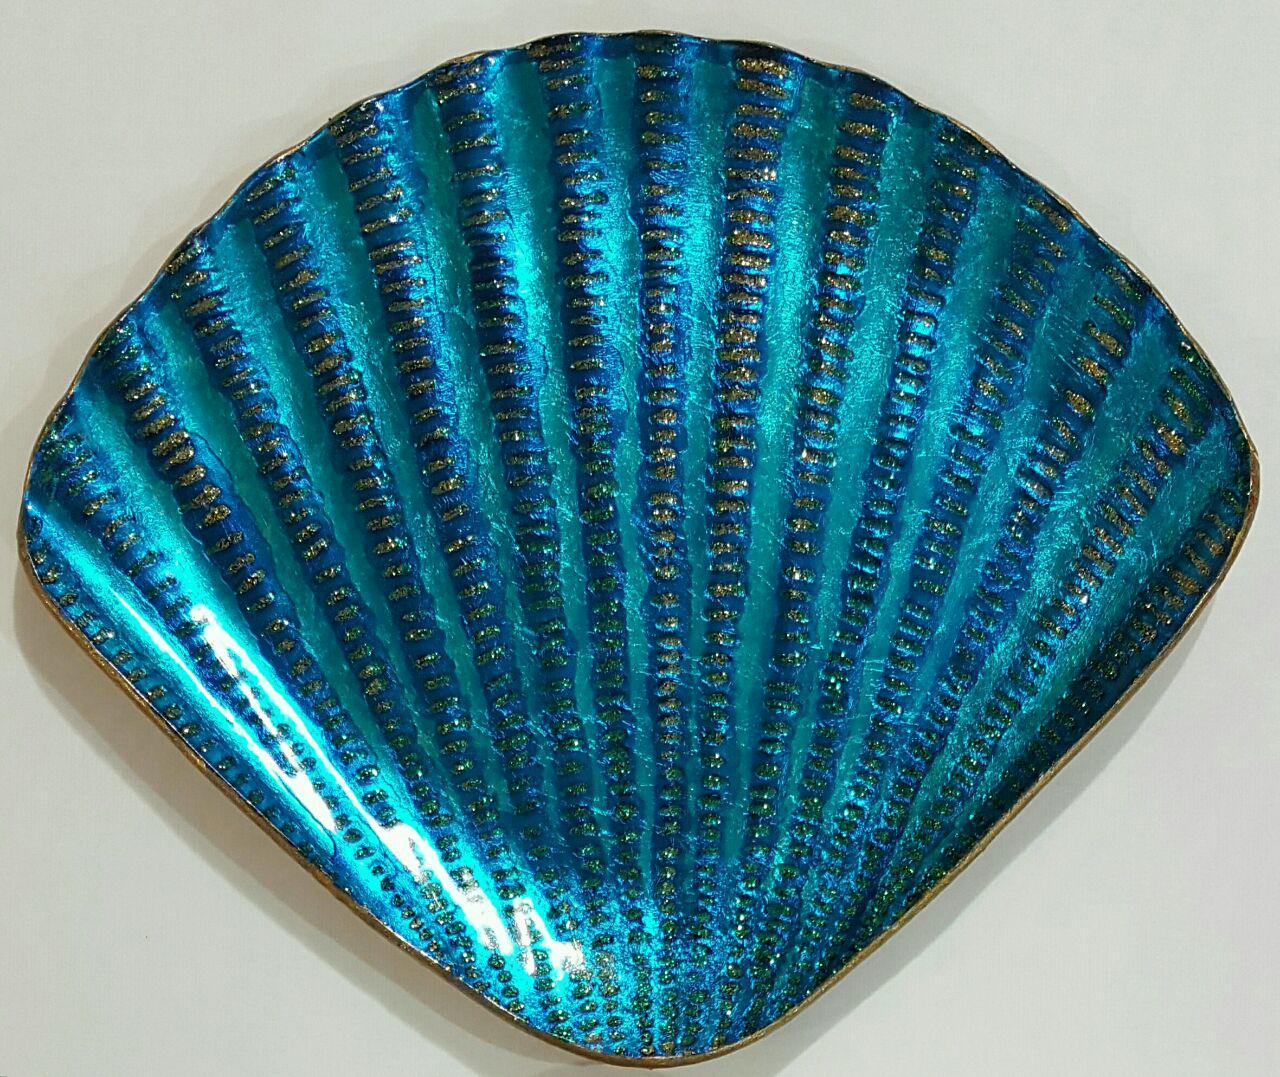 پیش دستی شیشه ای - طرح صدف